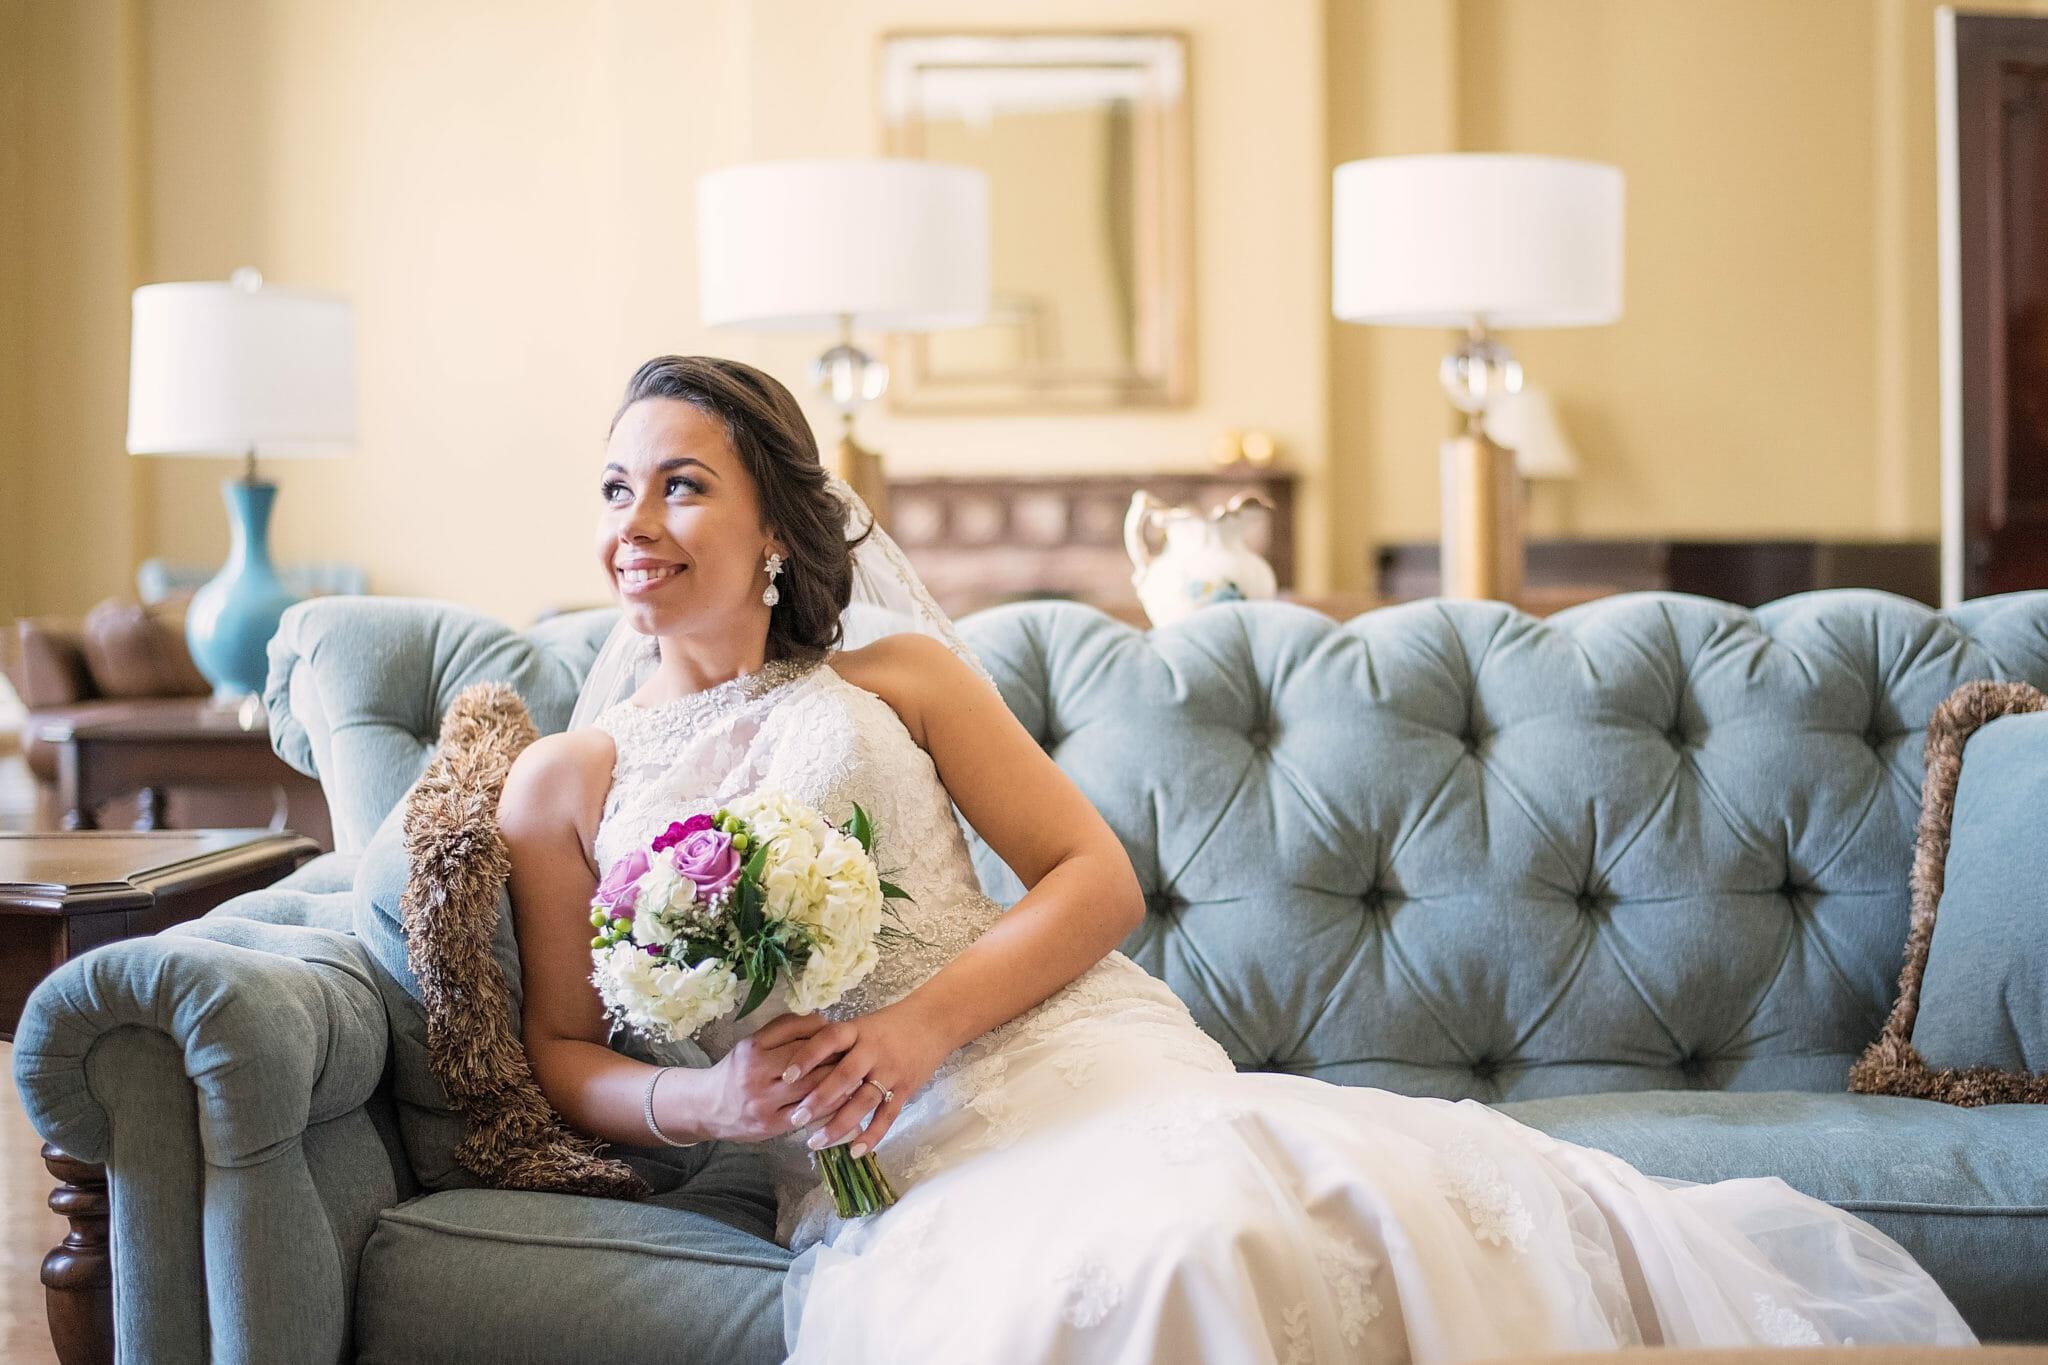 bride portrait taken at trafalgar castle wedding